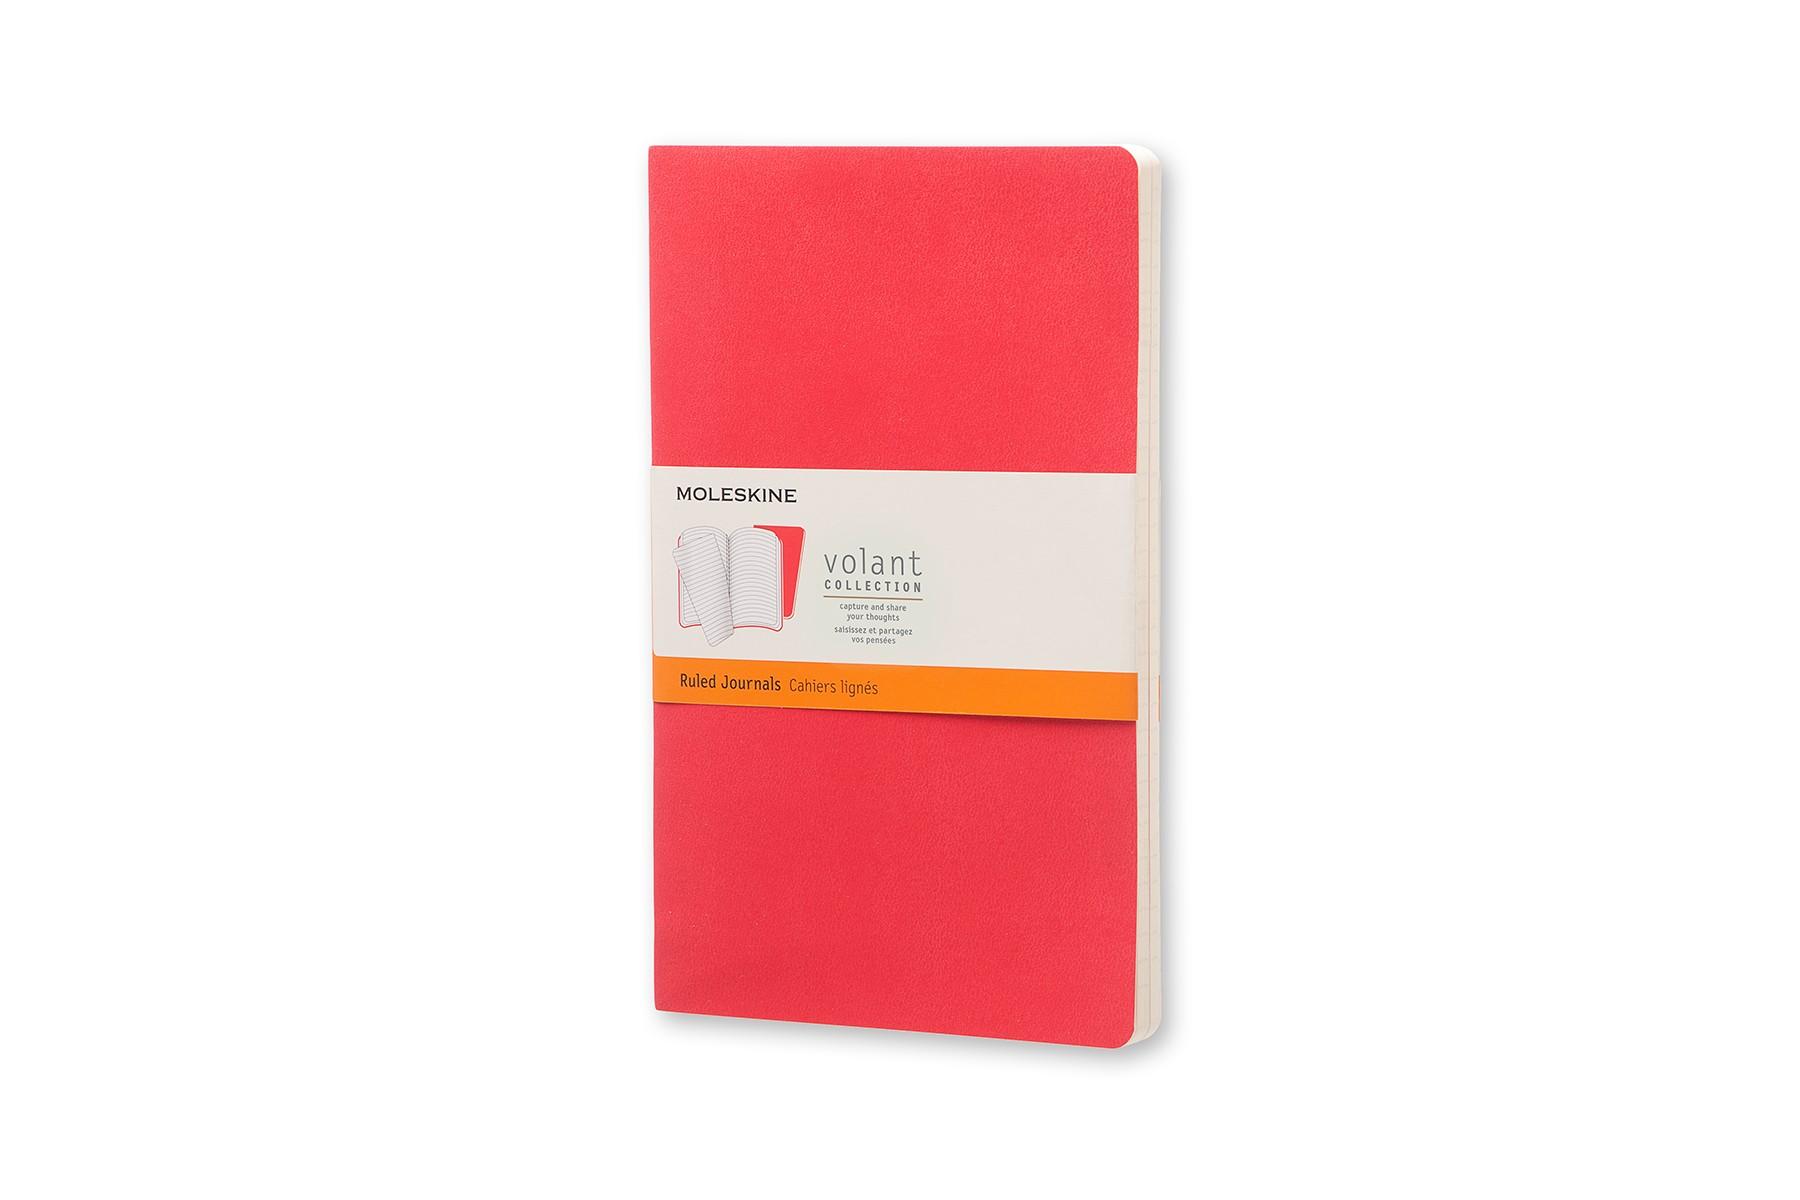 Moleskine Volant Journal Ruled Large Geranium Red/Scarlet Red